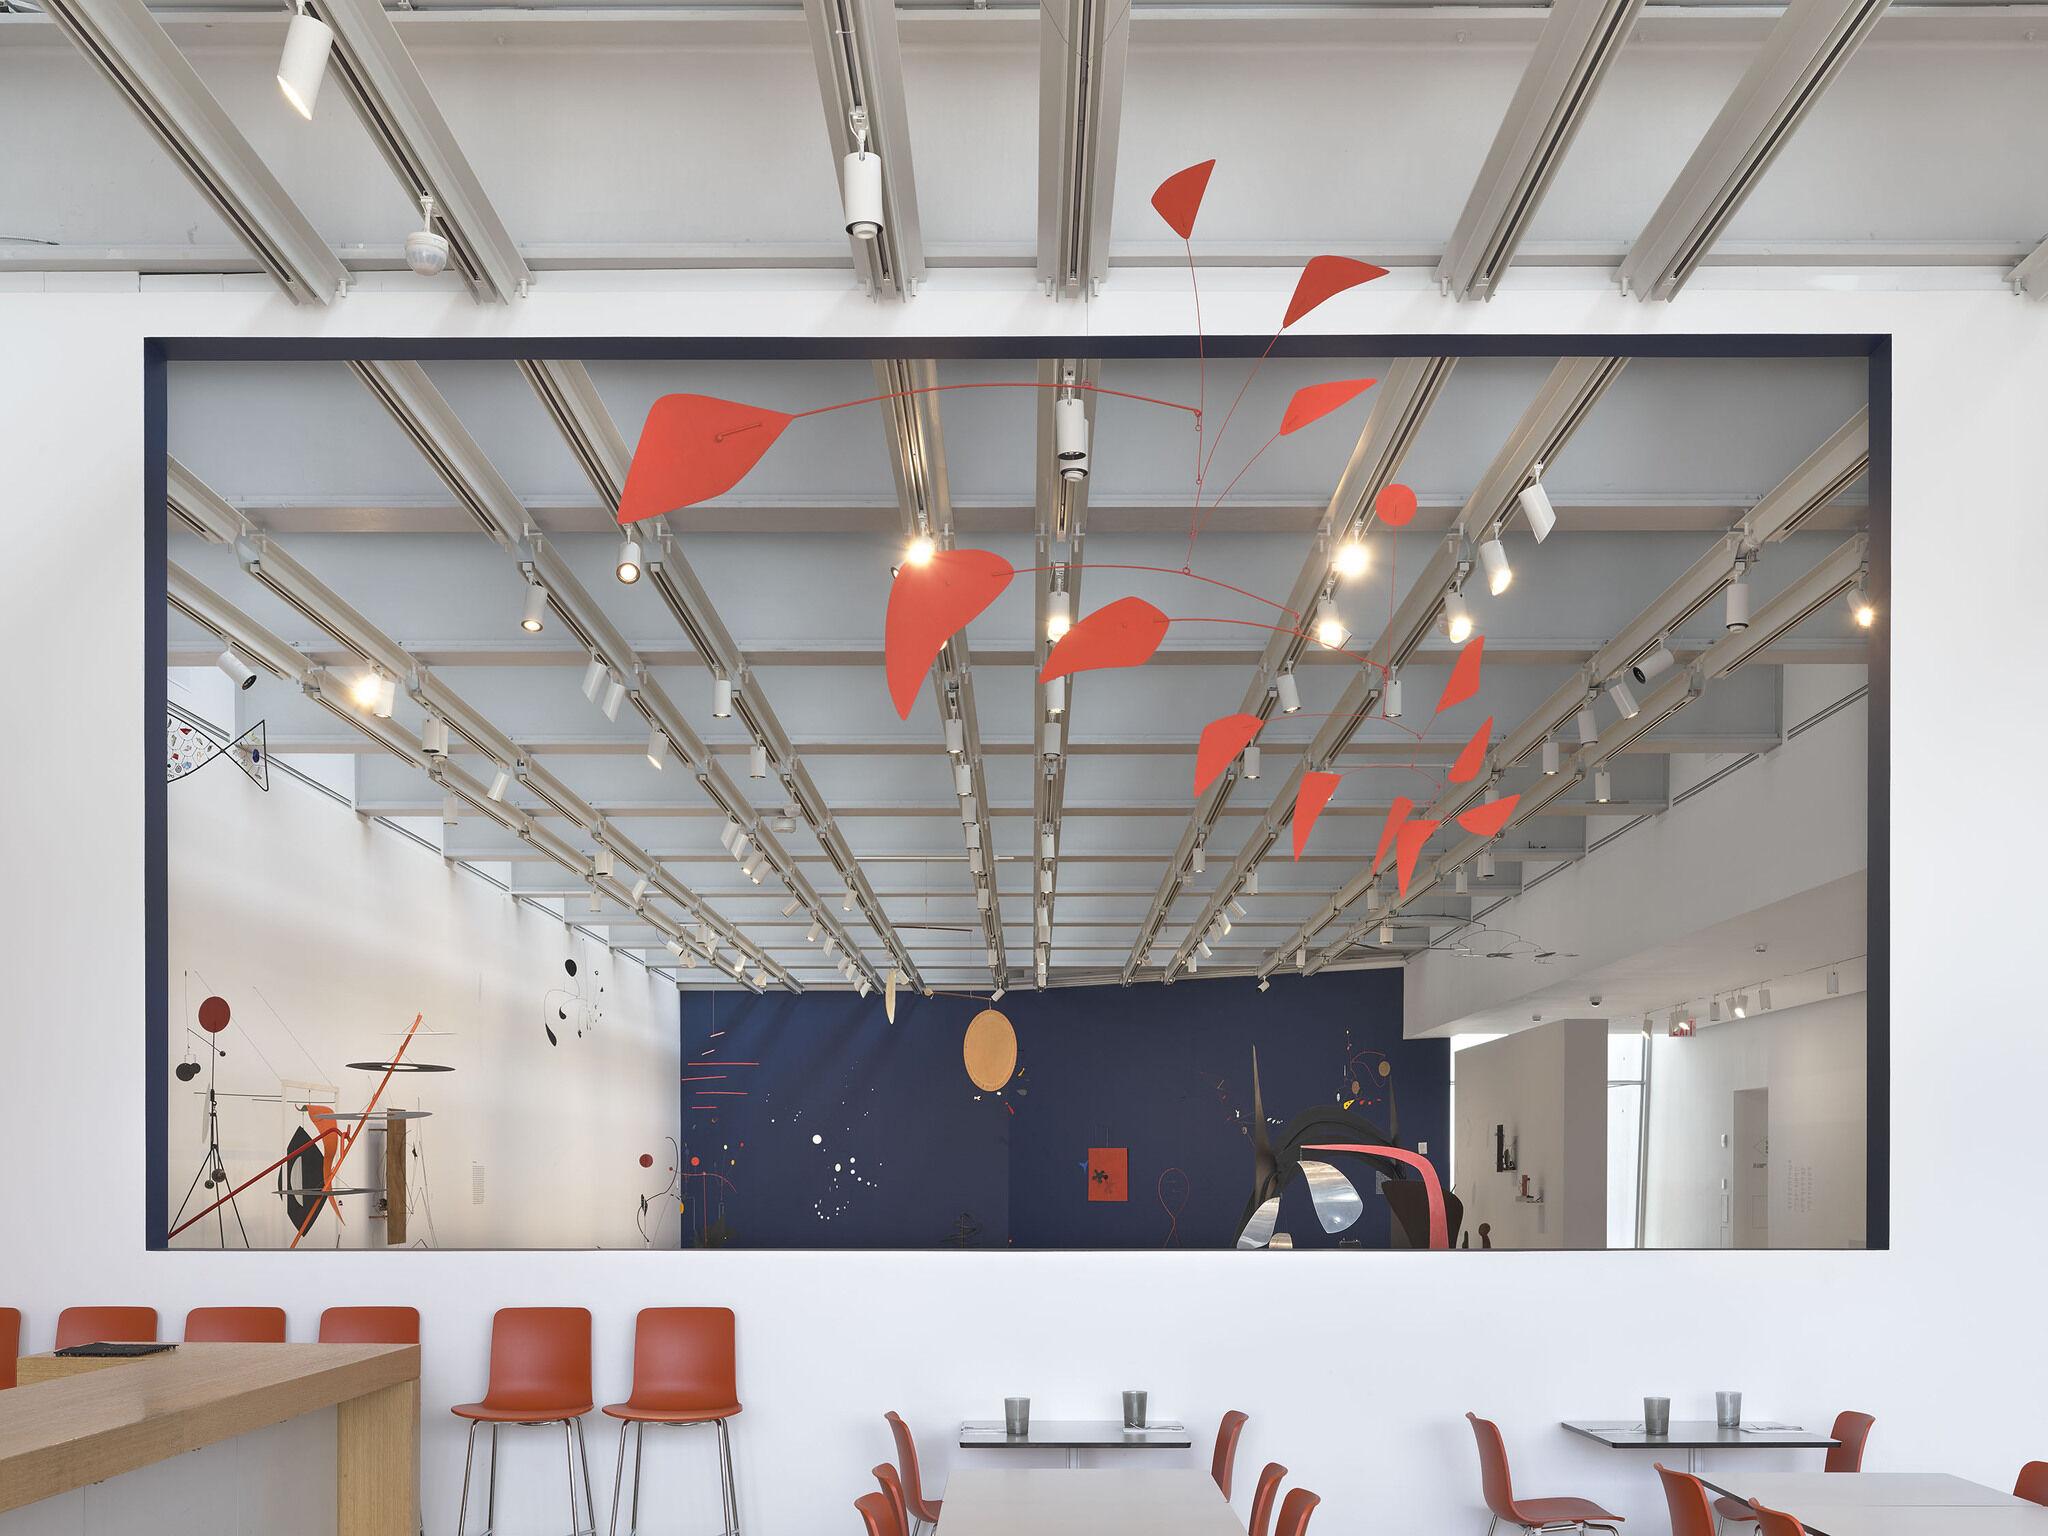 Gallery view of Calder: Hypermobility through Studio Cafe